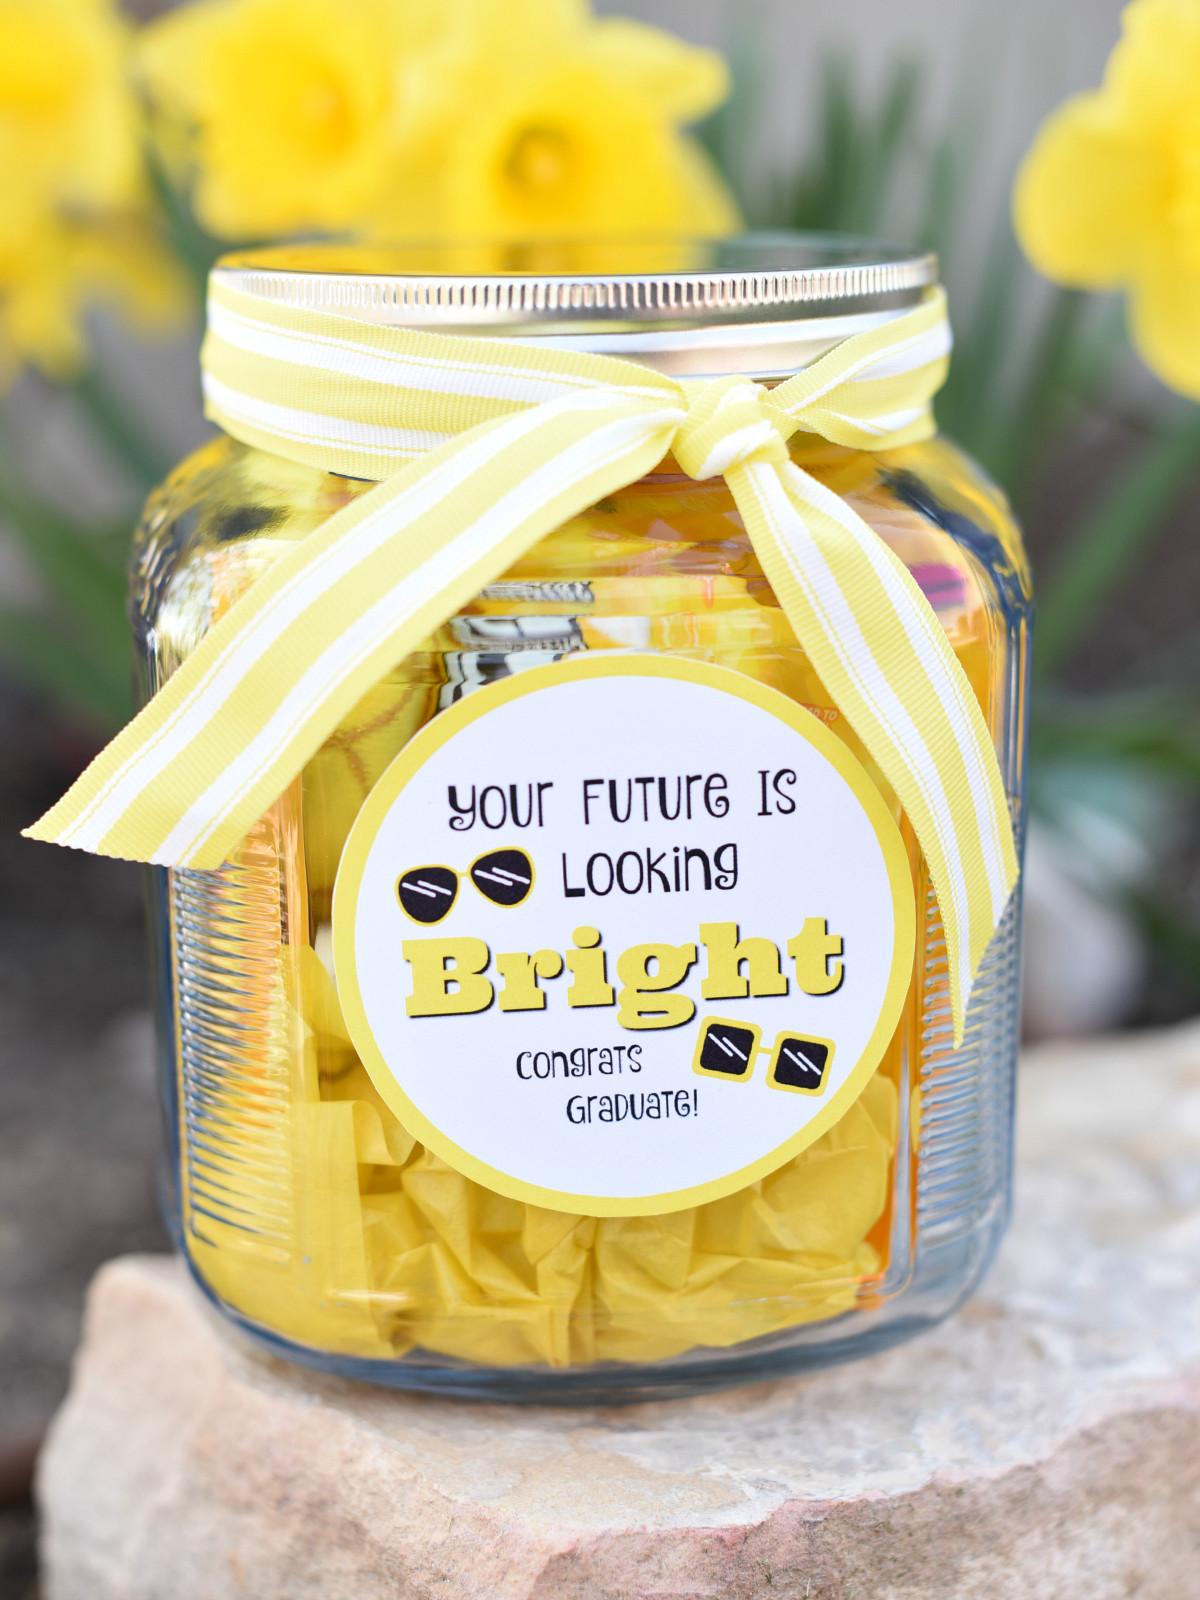 Graduation Gift Ideas Pinterest  25 Fun & Unique Graduation Gifts – Fun Squared